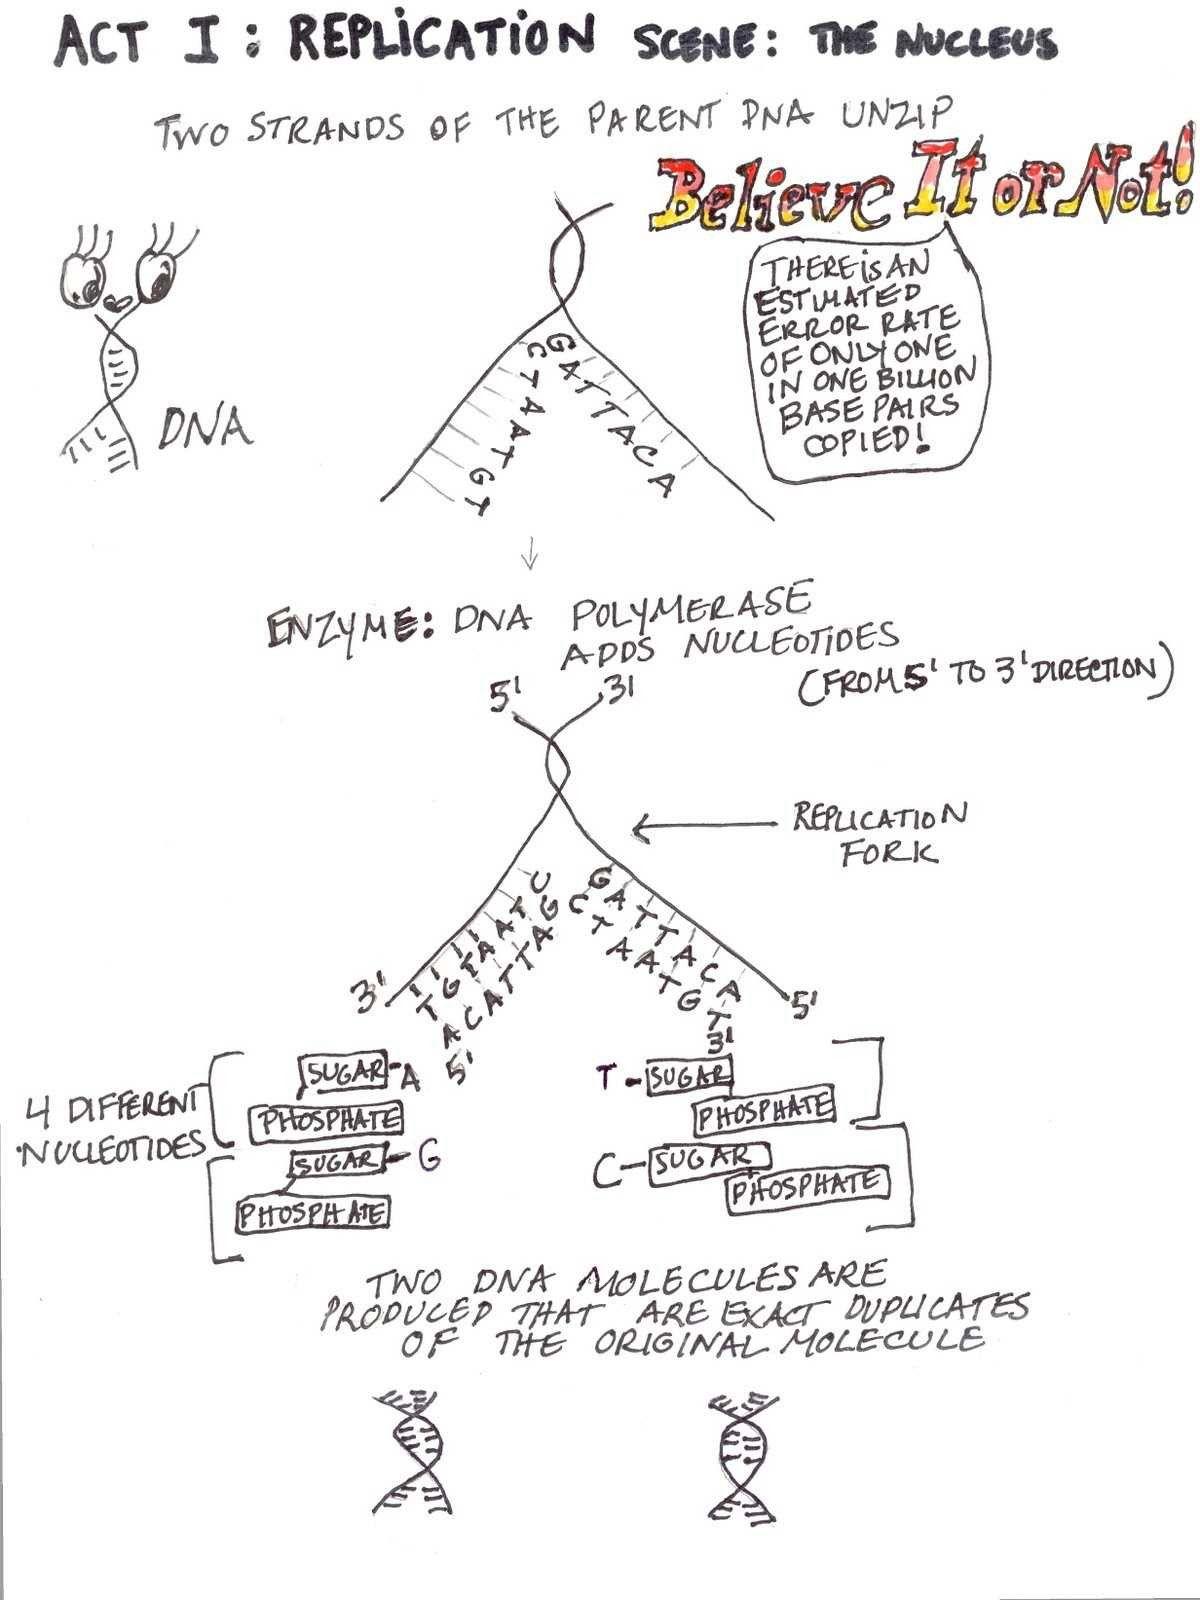 Dna Replication Coloring Worksheet In 2020 Dna Replication Protein Synthesis Dna Replication Activity